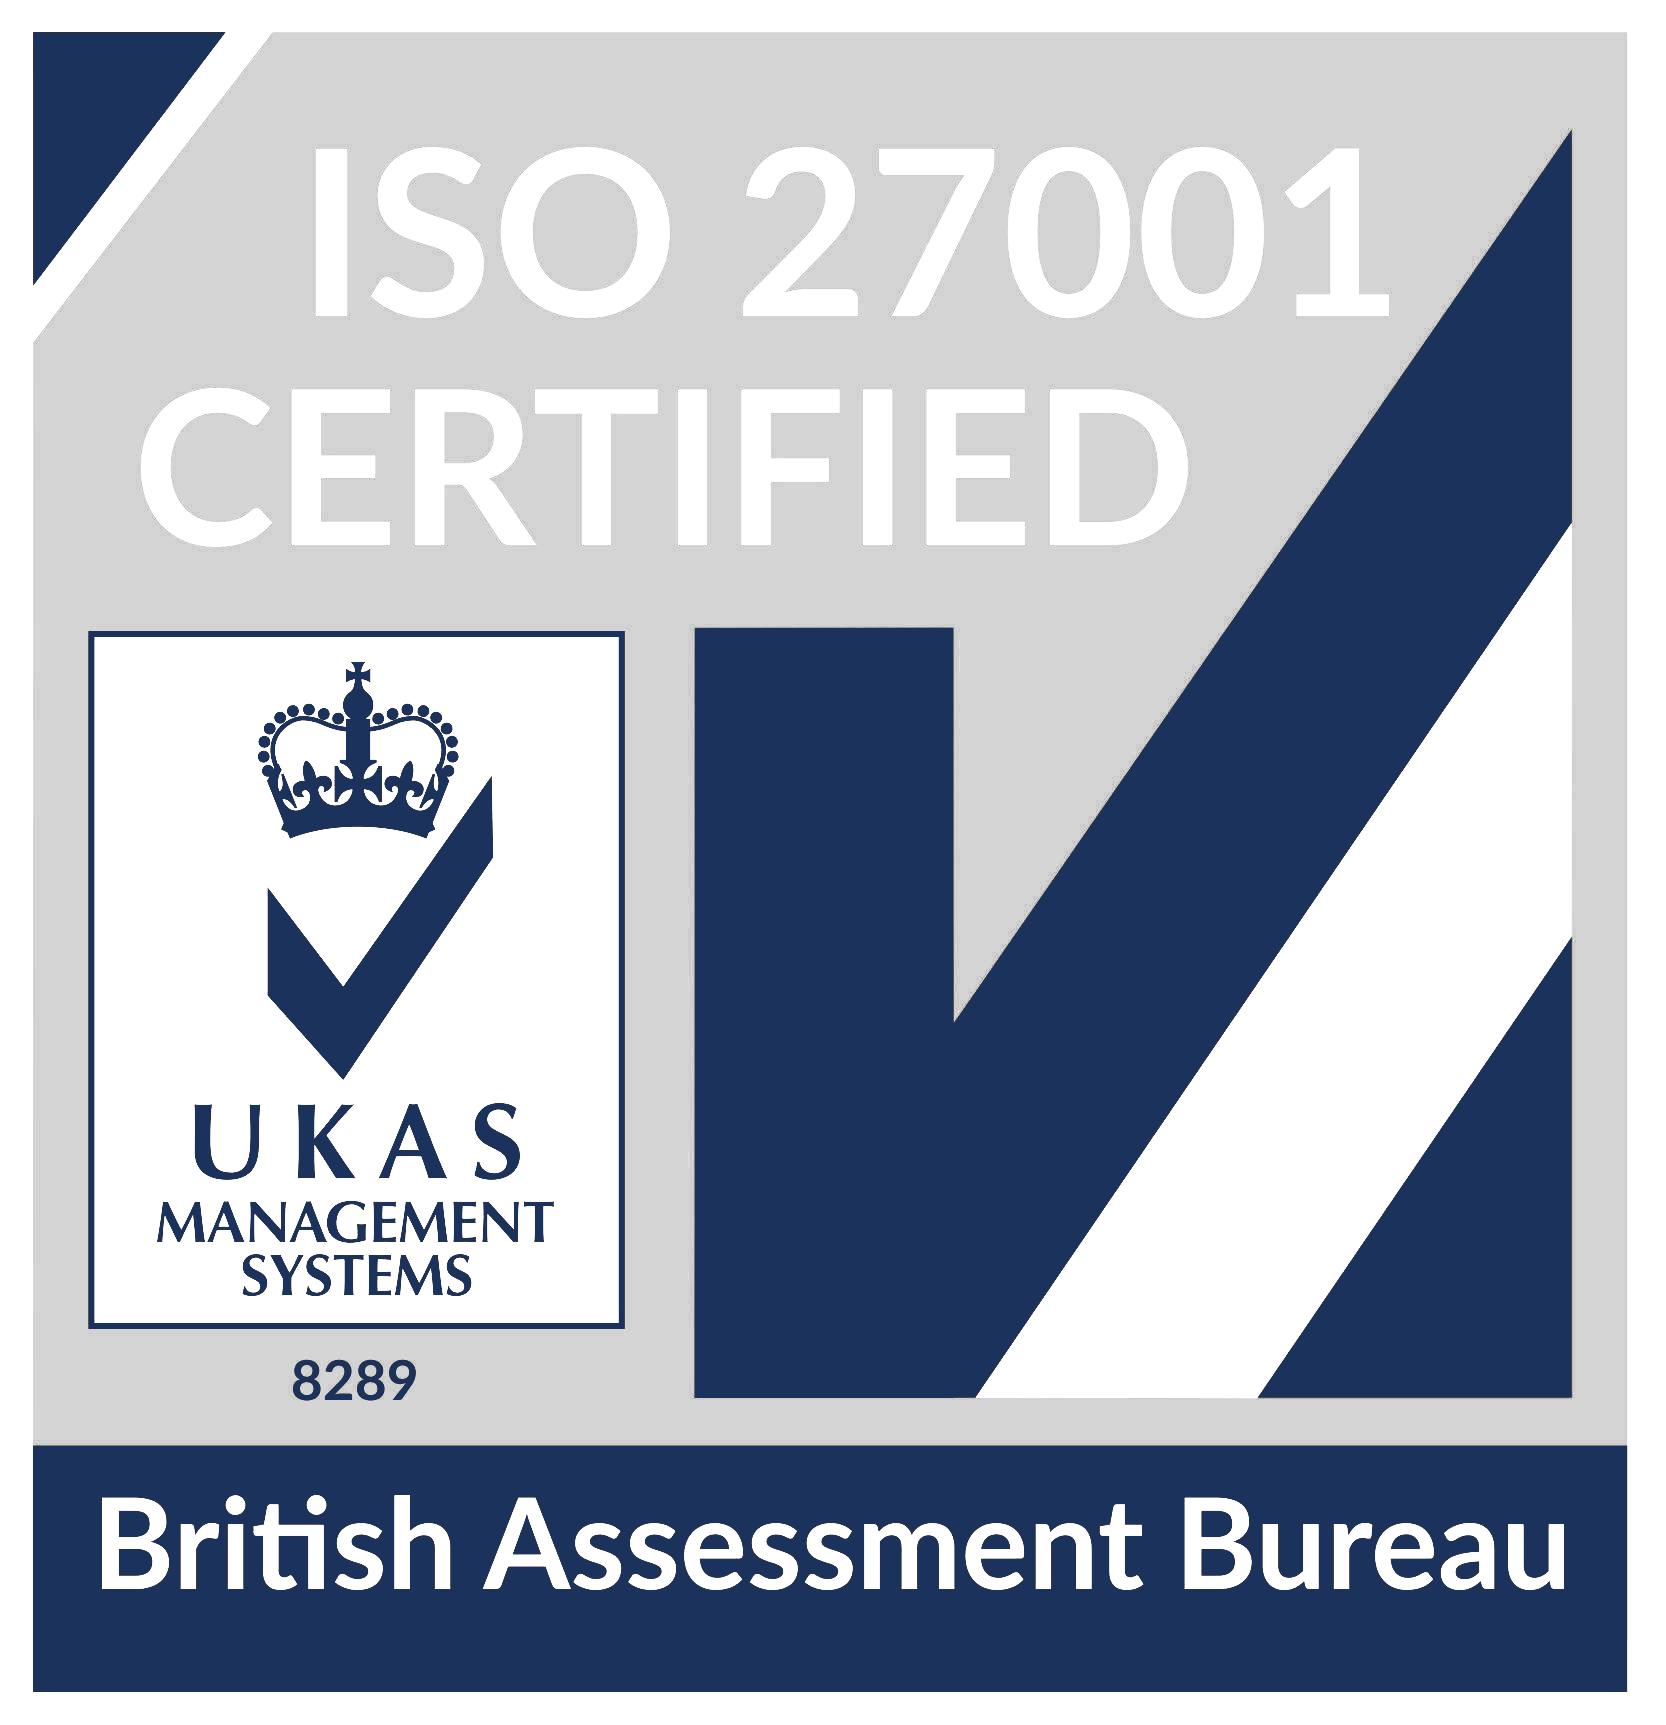 UKAS-ISO-27001 (1)